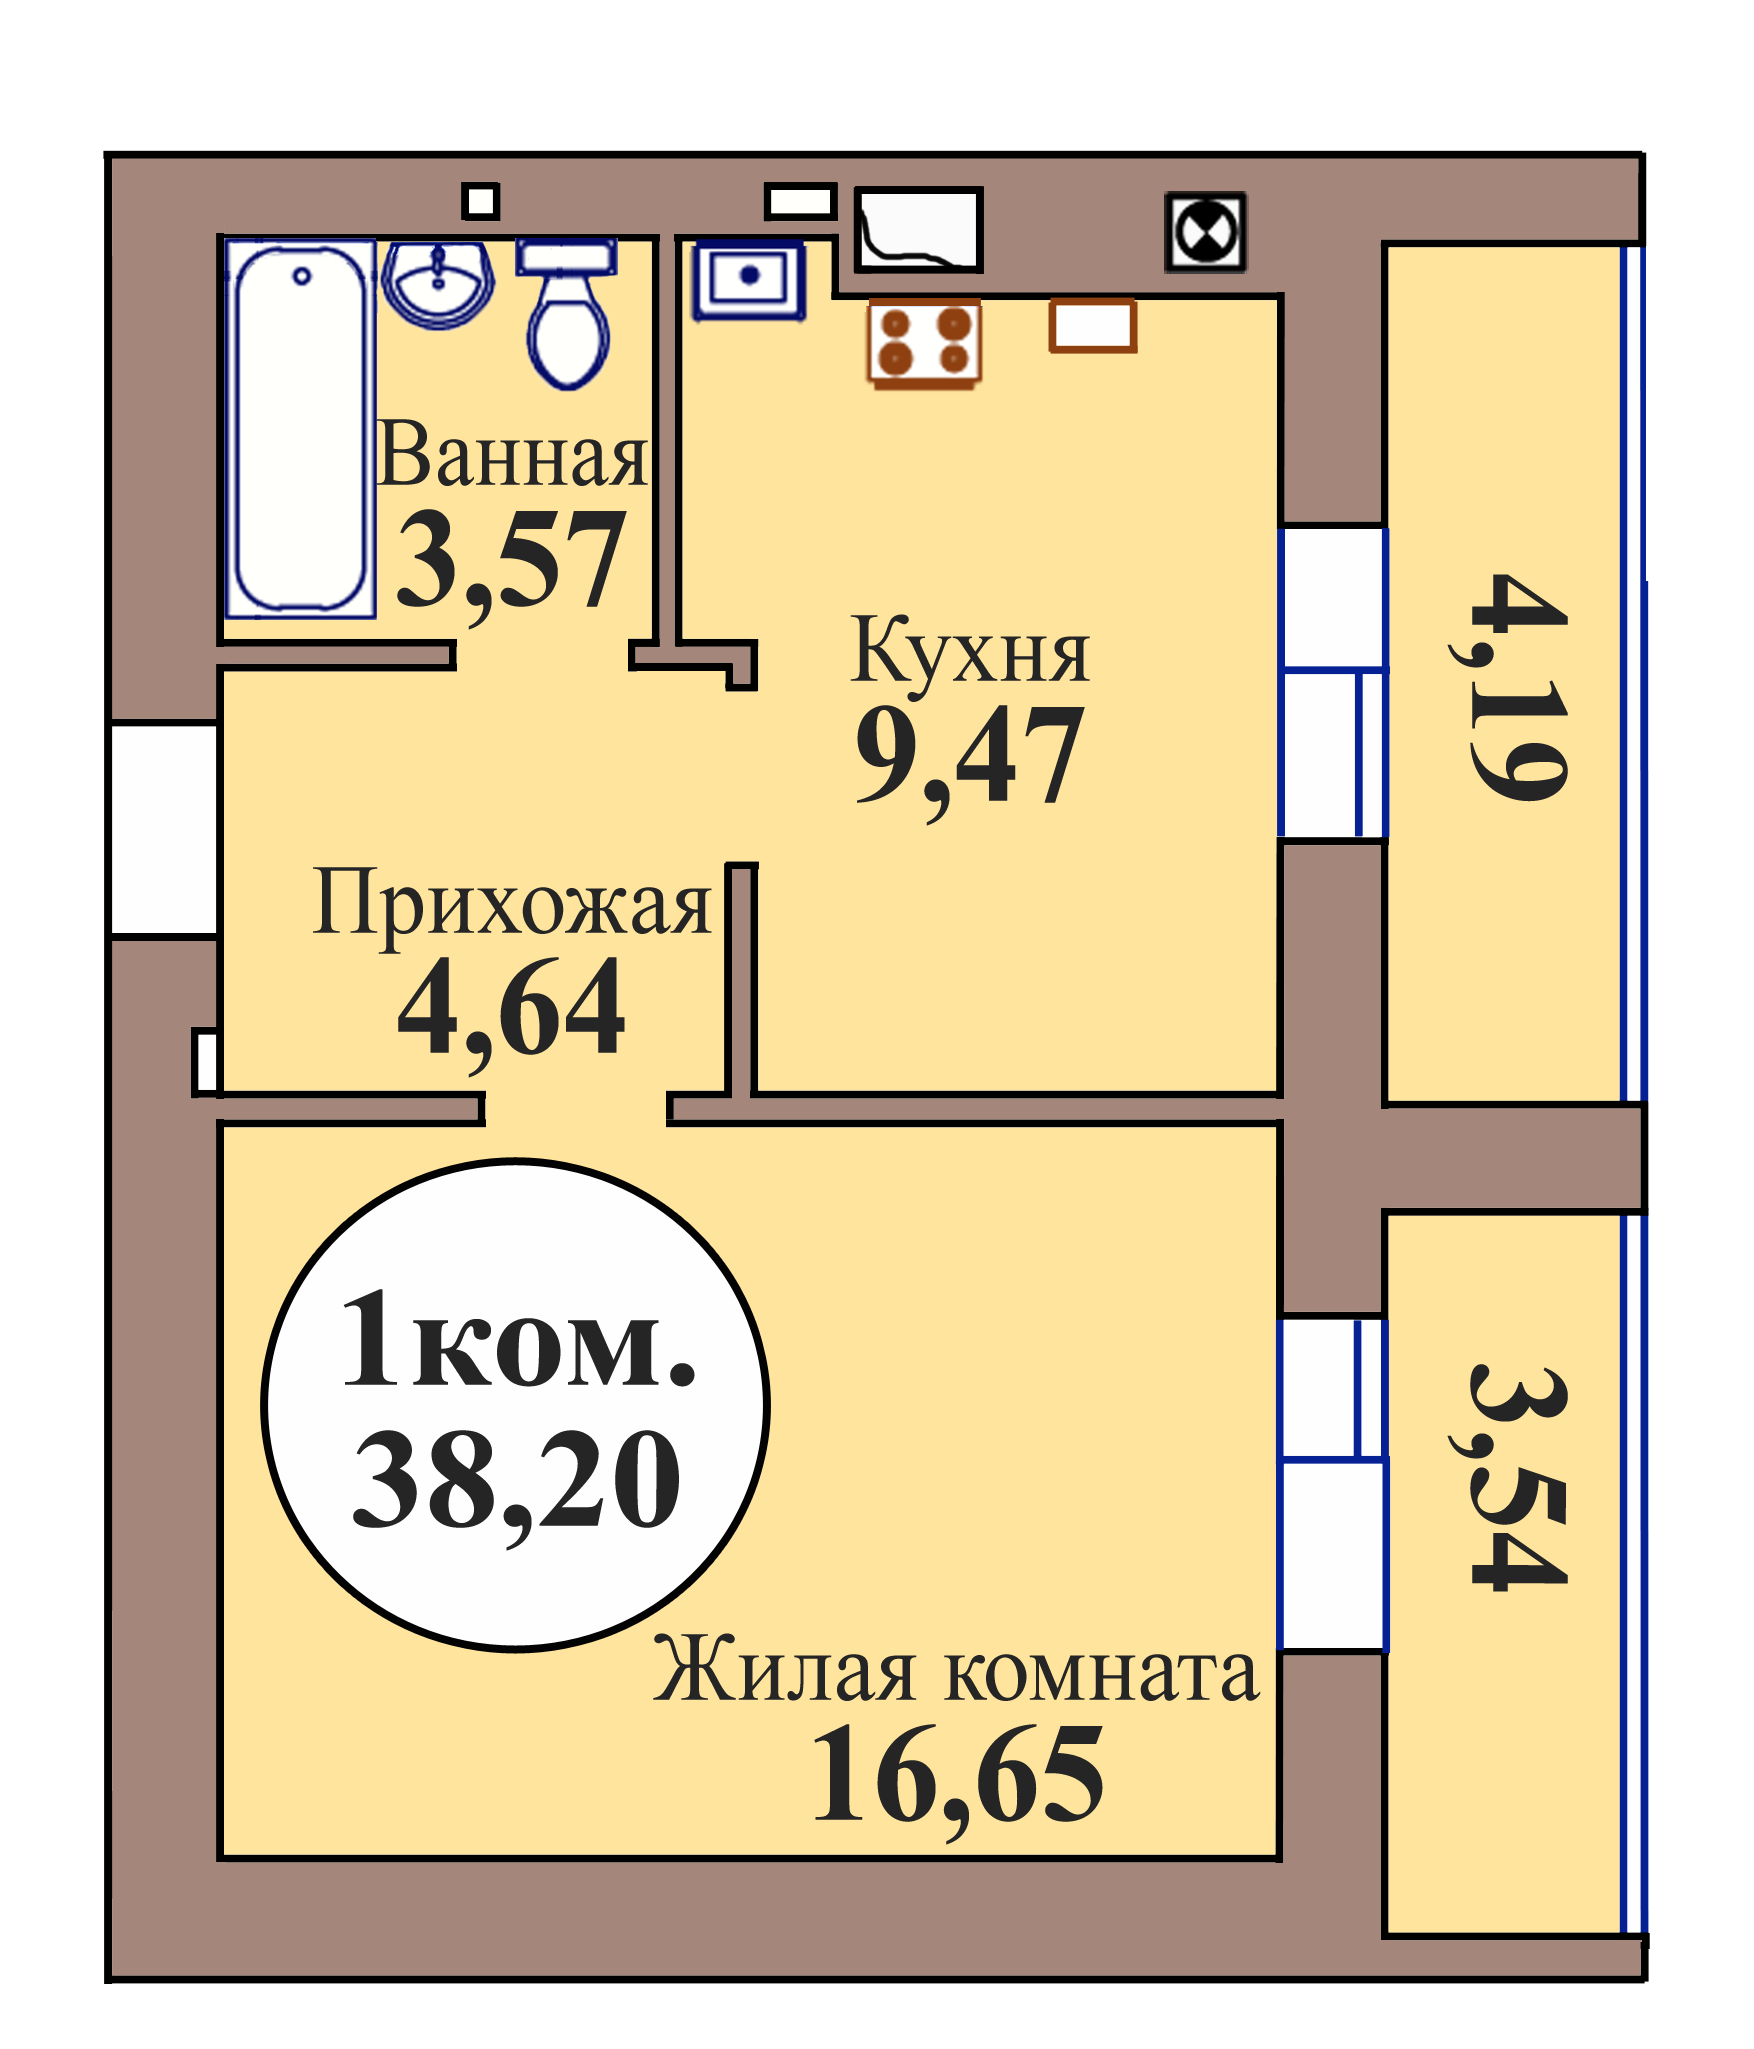 1-комн. кв. по пер. Калининградский, 5 кв. 49 в Калининграде